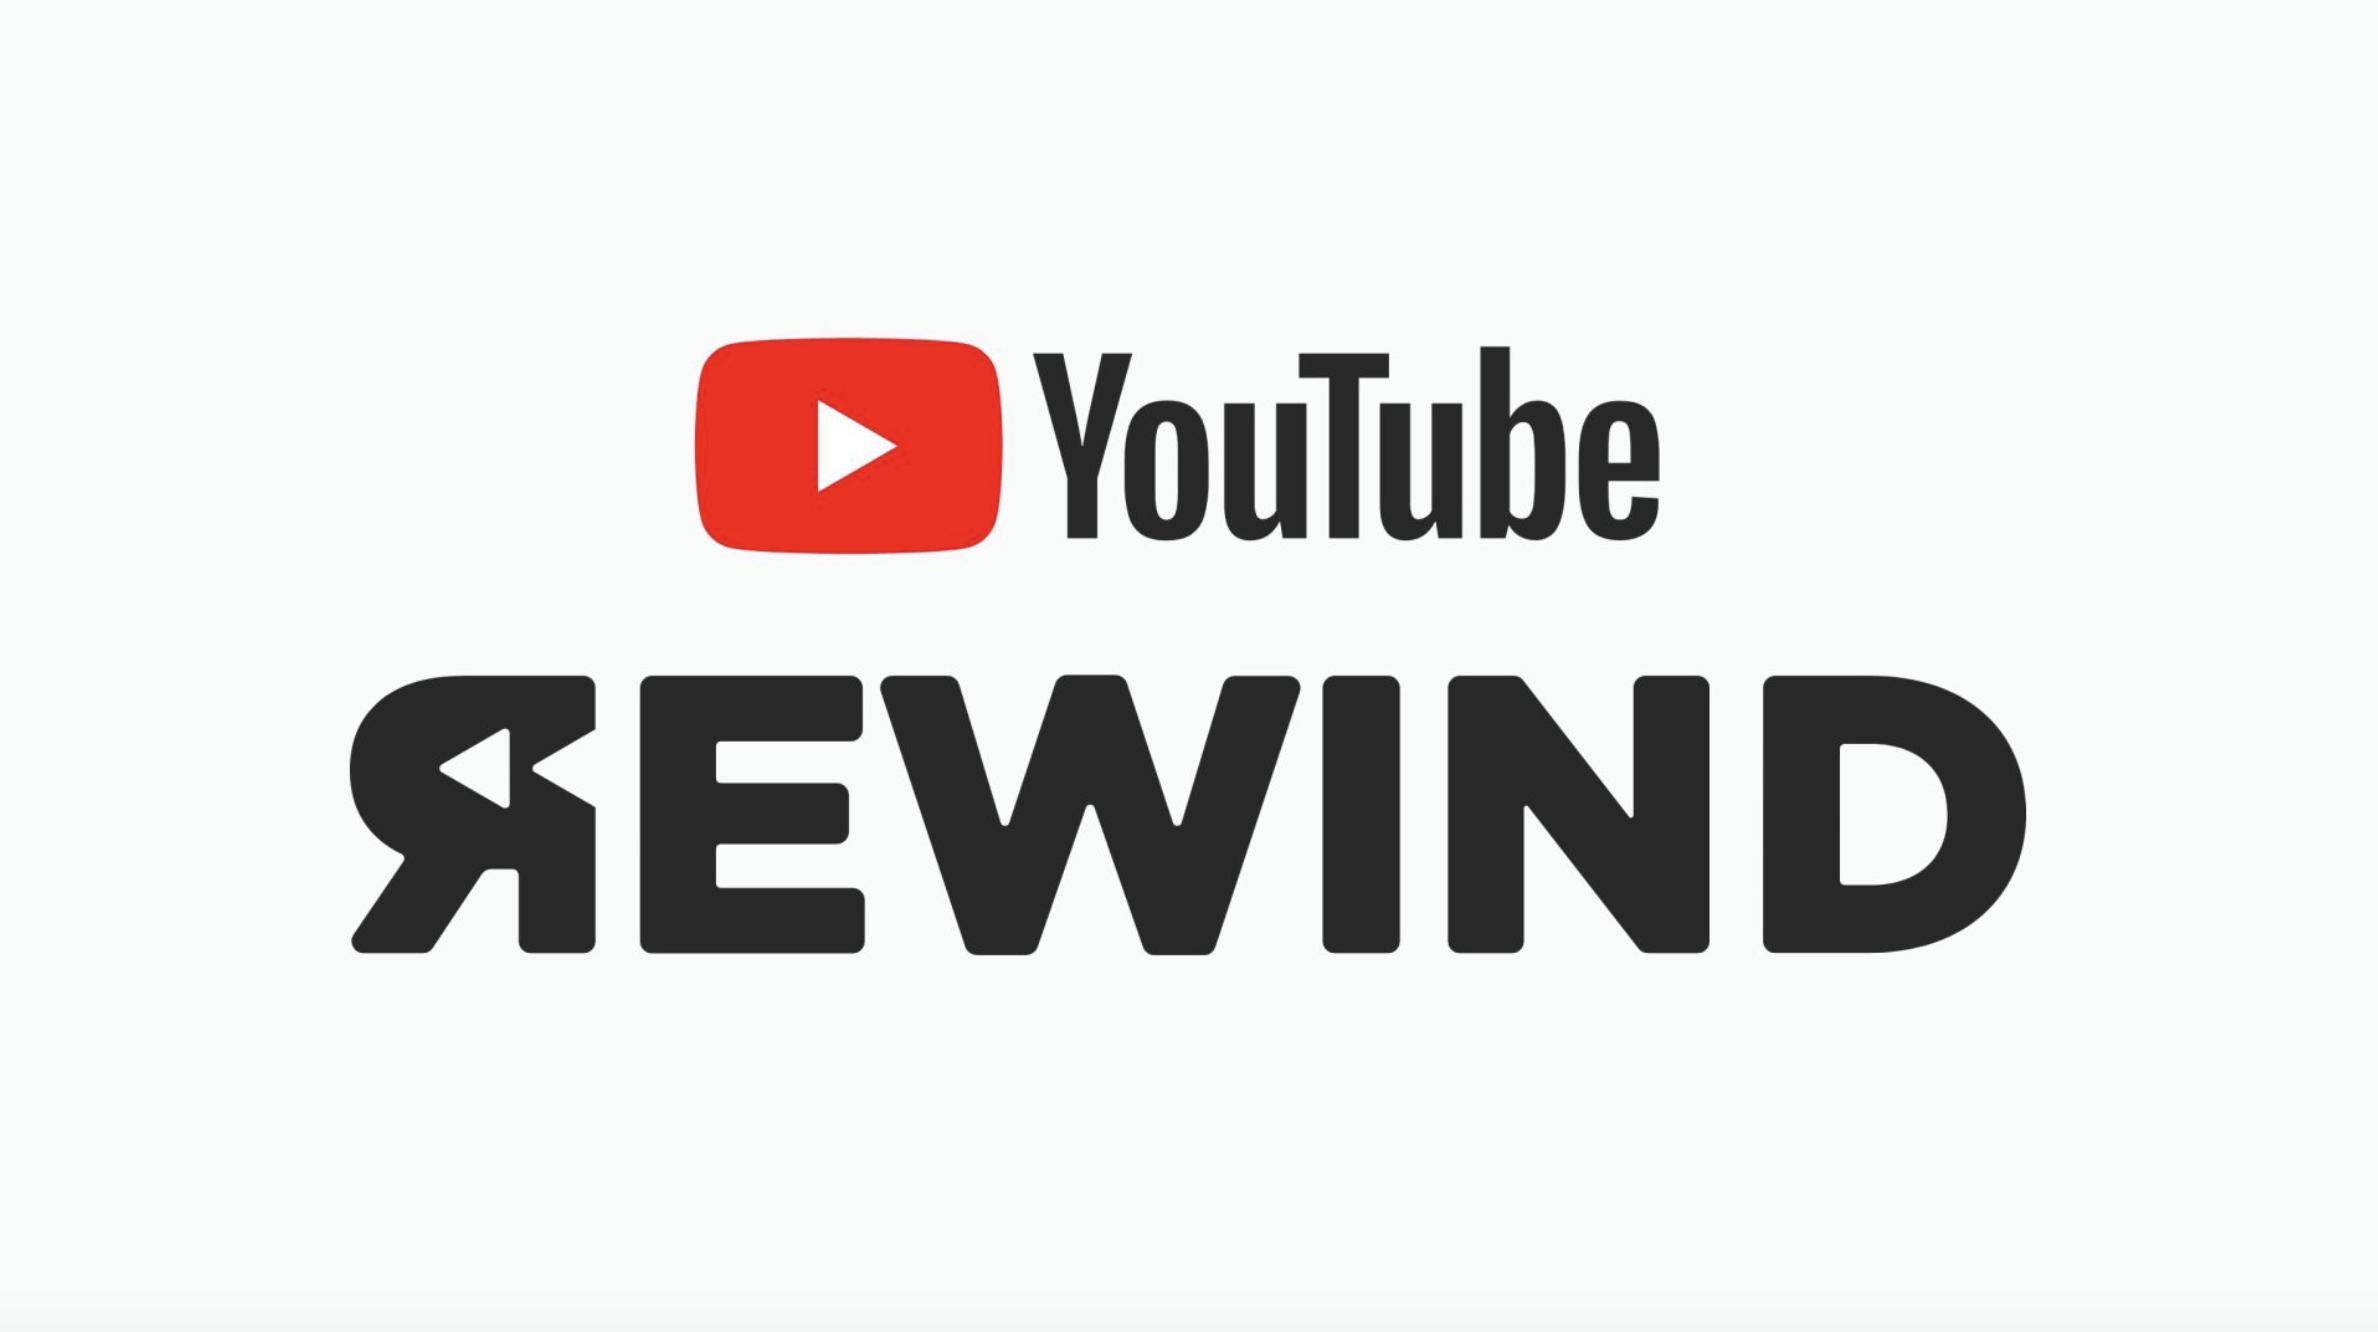 YouTube Rewind Logo